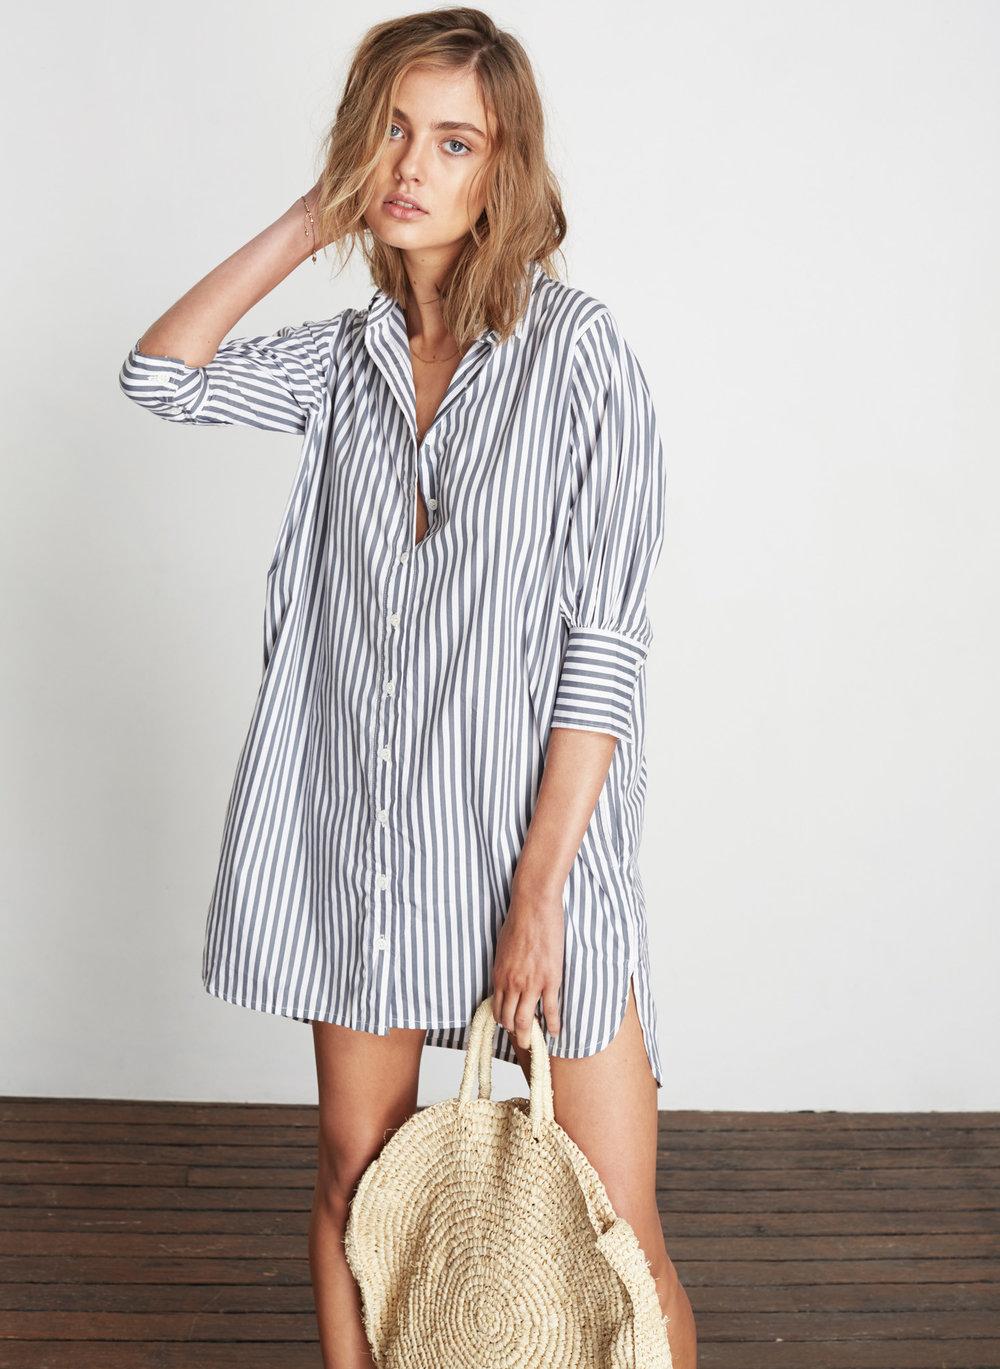 100% Cotton shirt dress by   faithfull